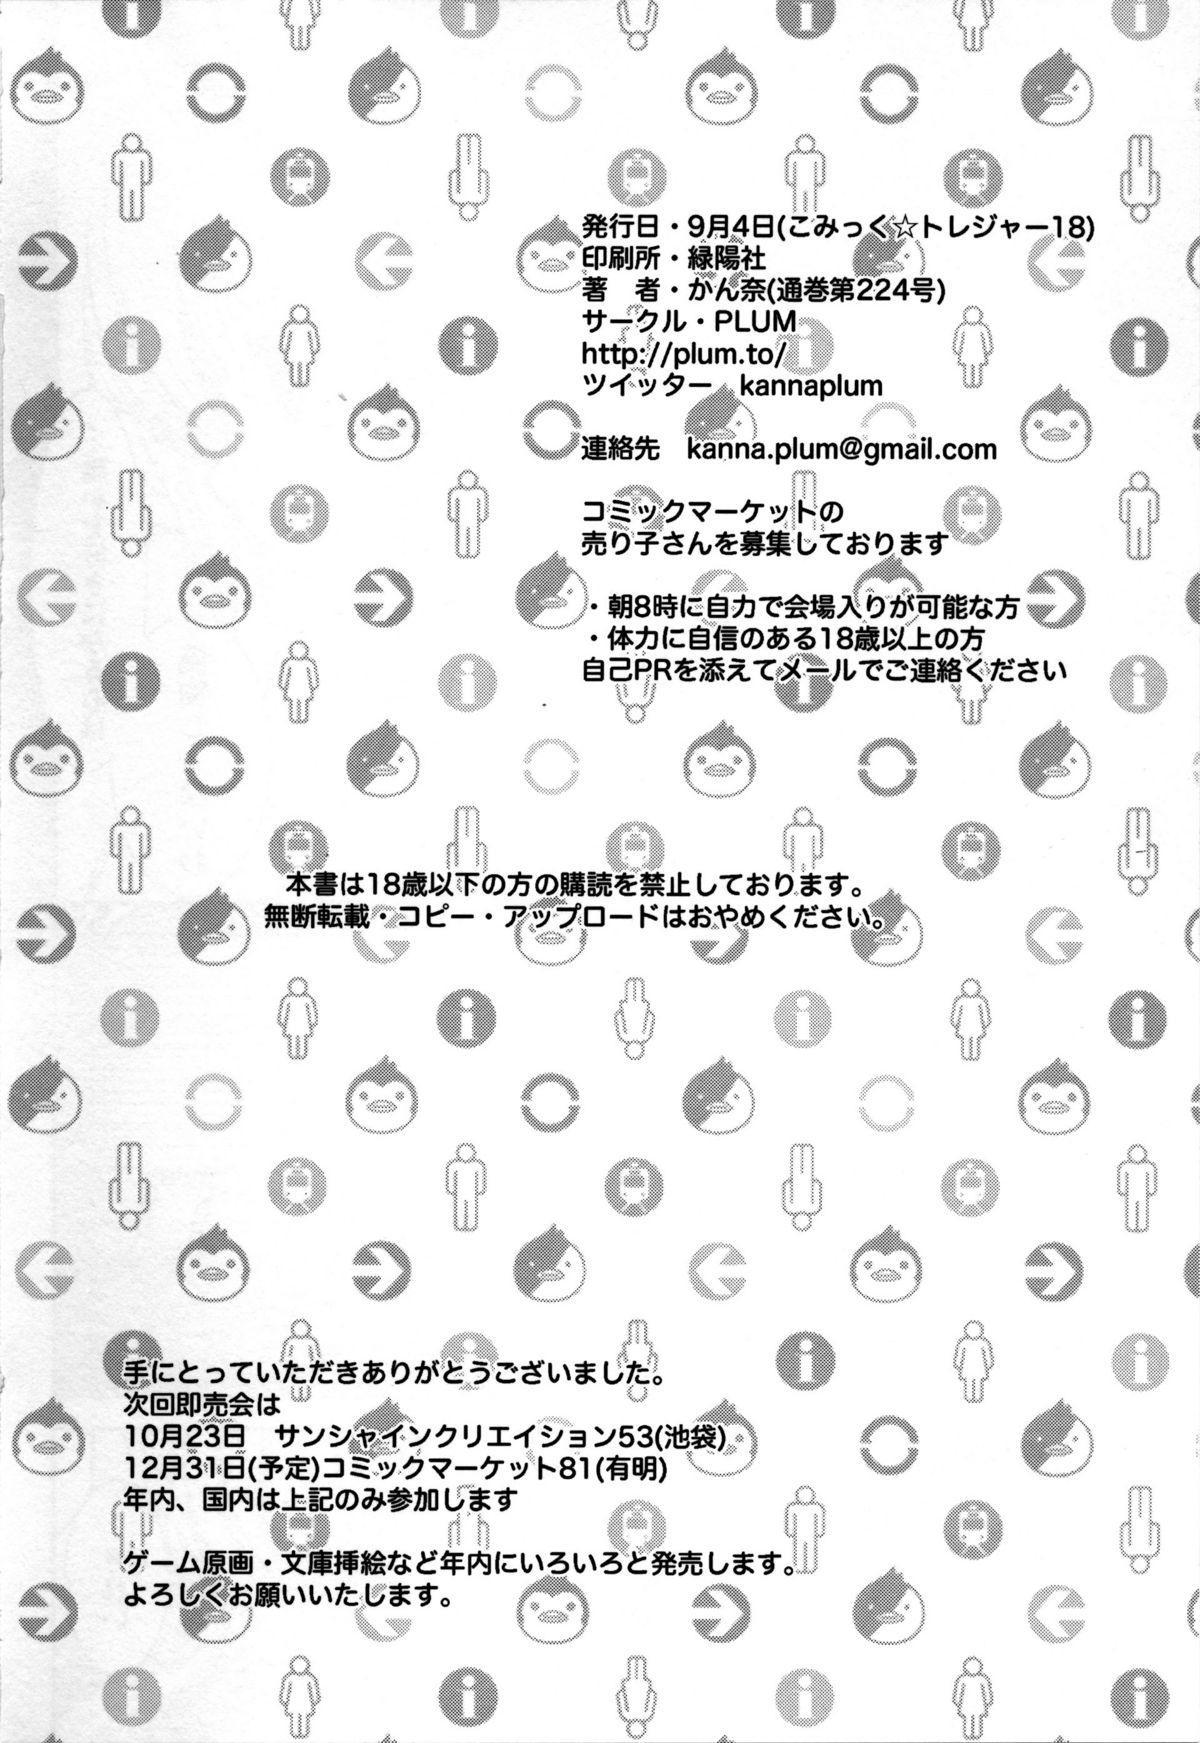 PLUMATION 20110904 17